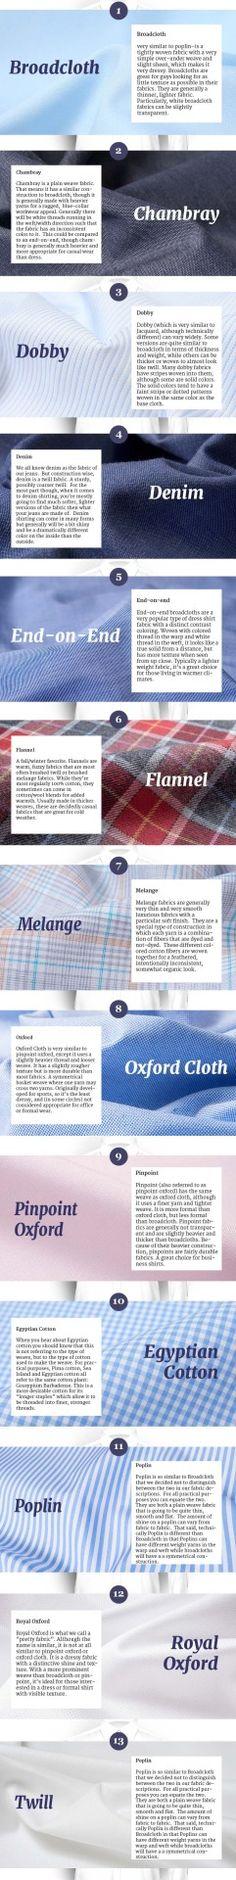 A visual glossary of dress shirt fabrics